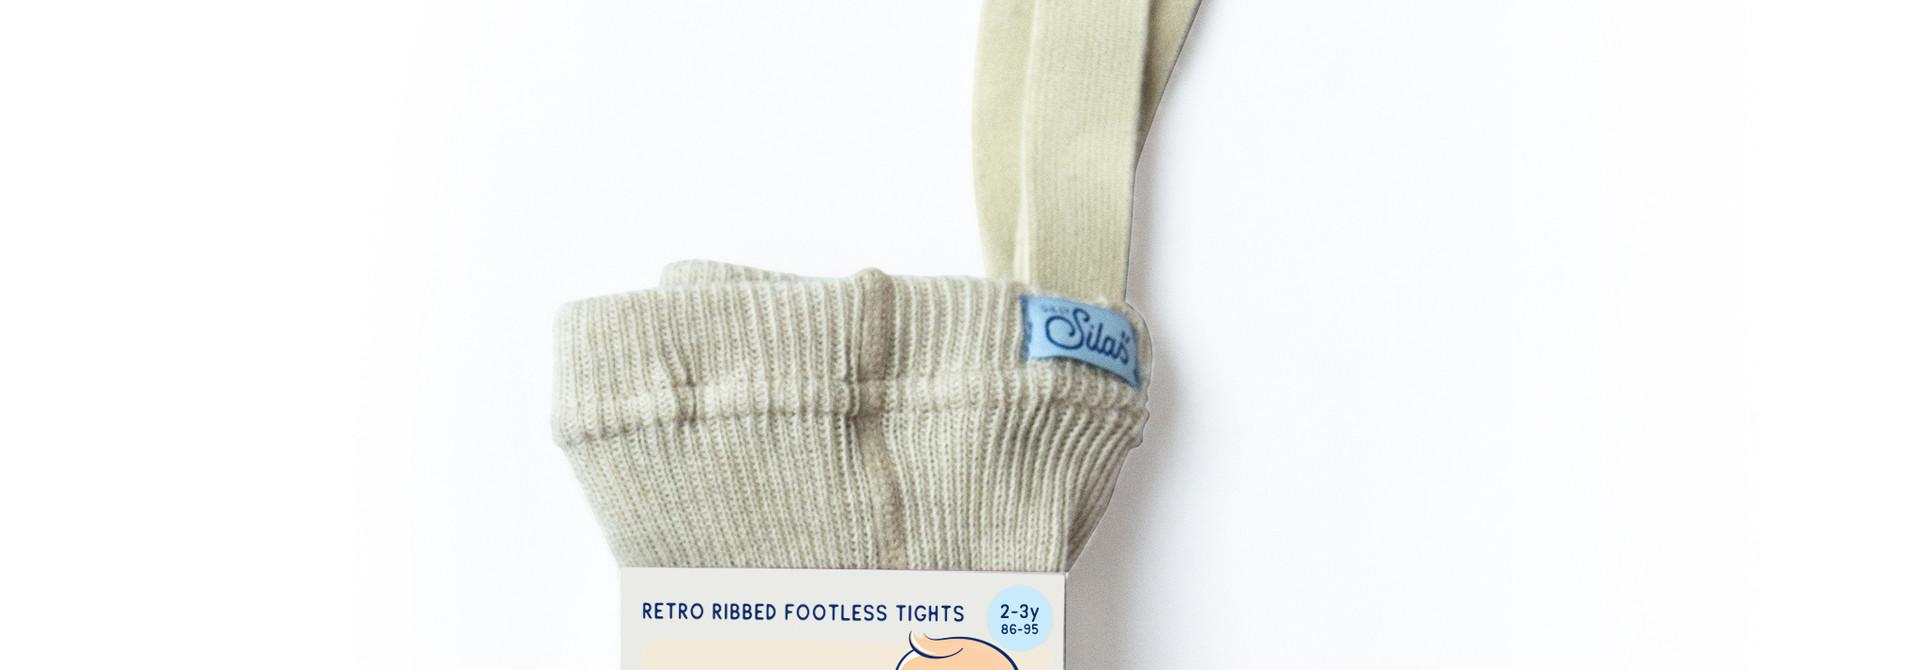 Footless Tights - Cream